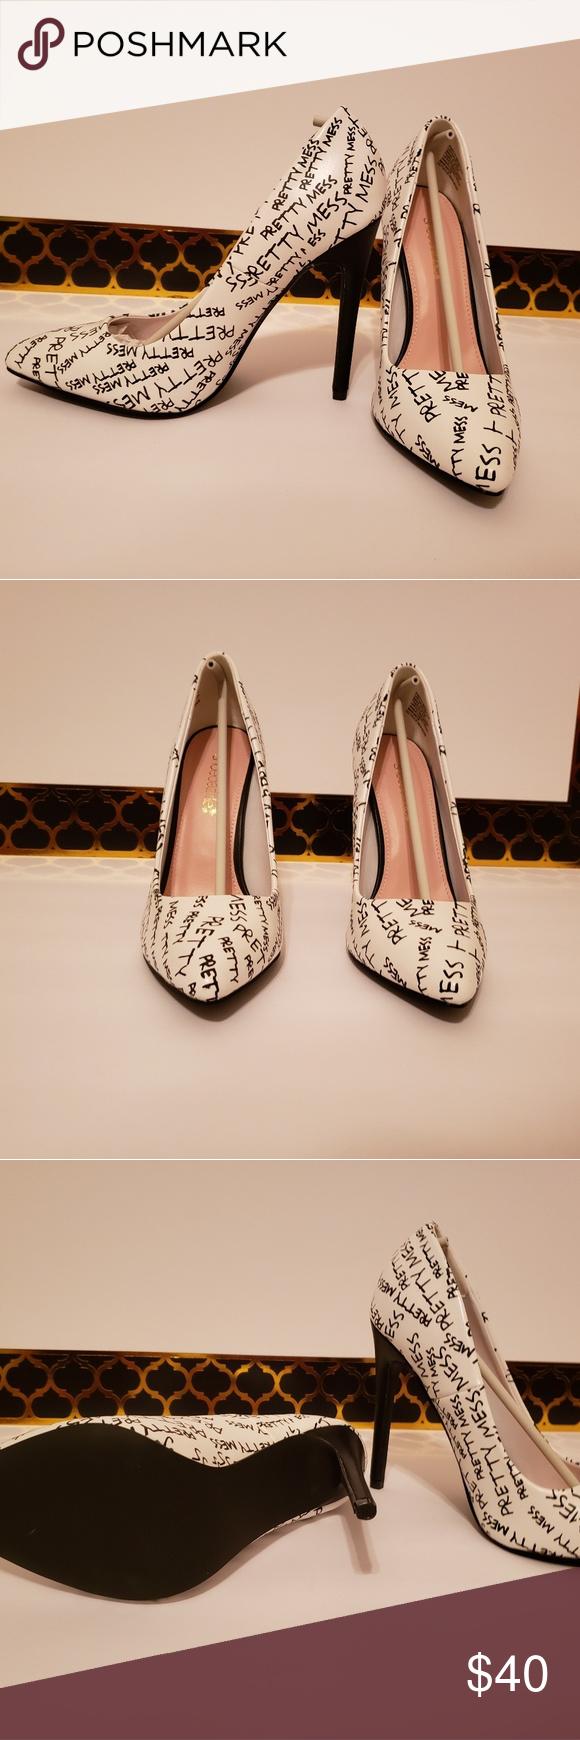 Pretty Mess Graffiti Pumps Shoes Women Heels Pretty Mess Heels